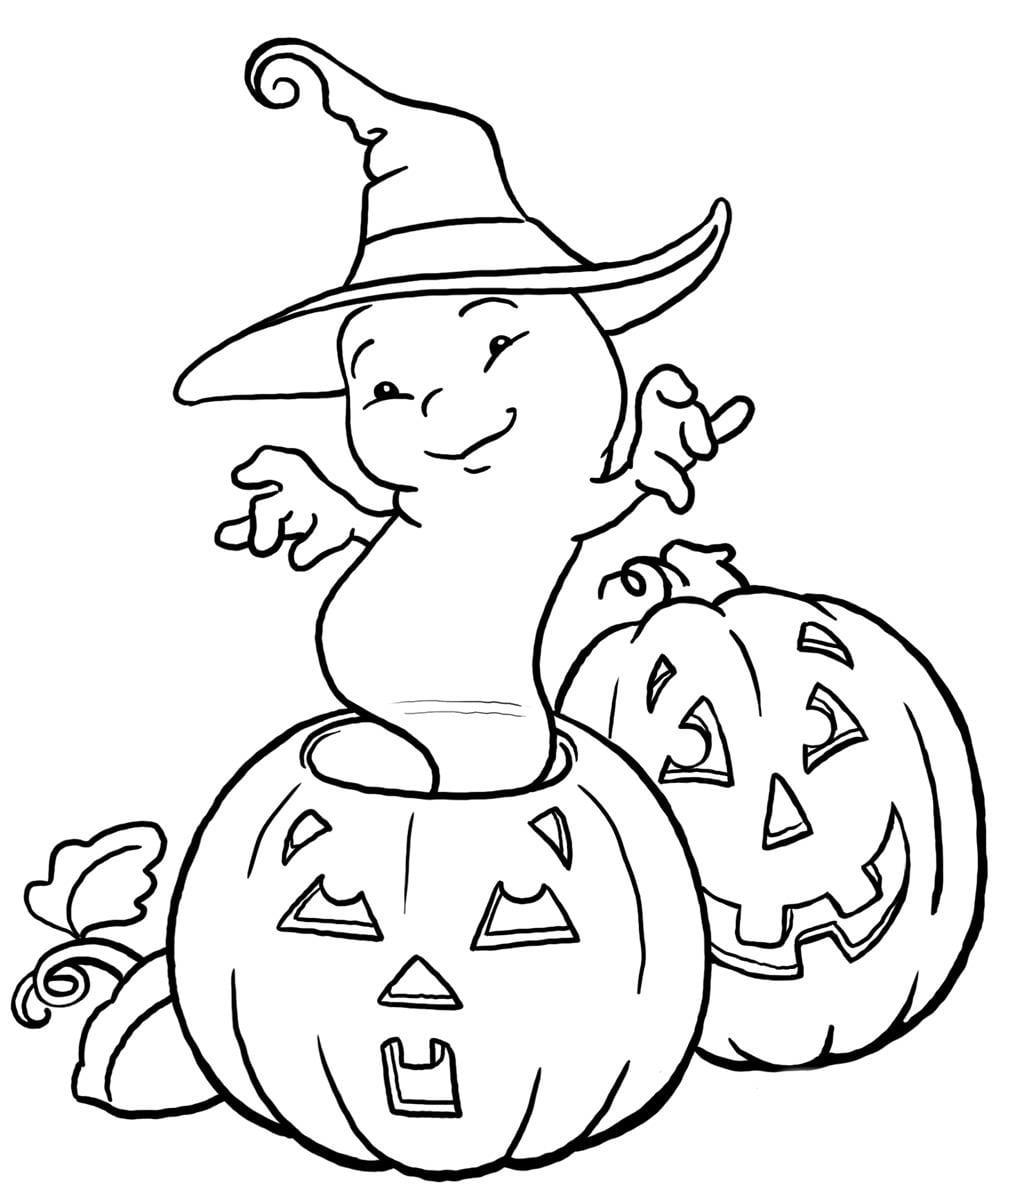 Halloween Desenhos Para Imprimir